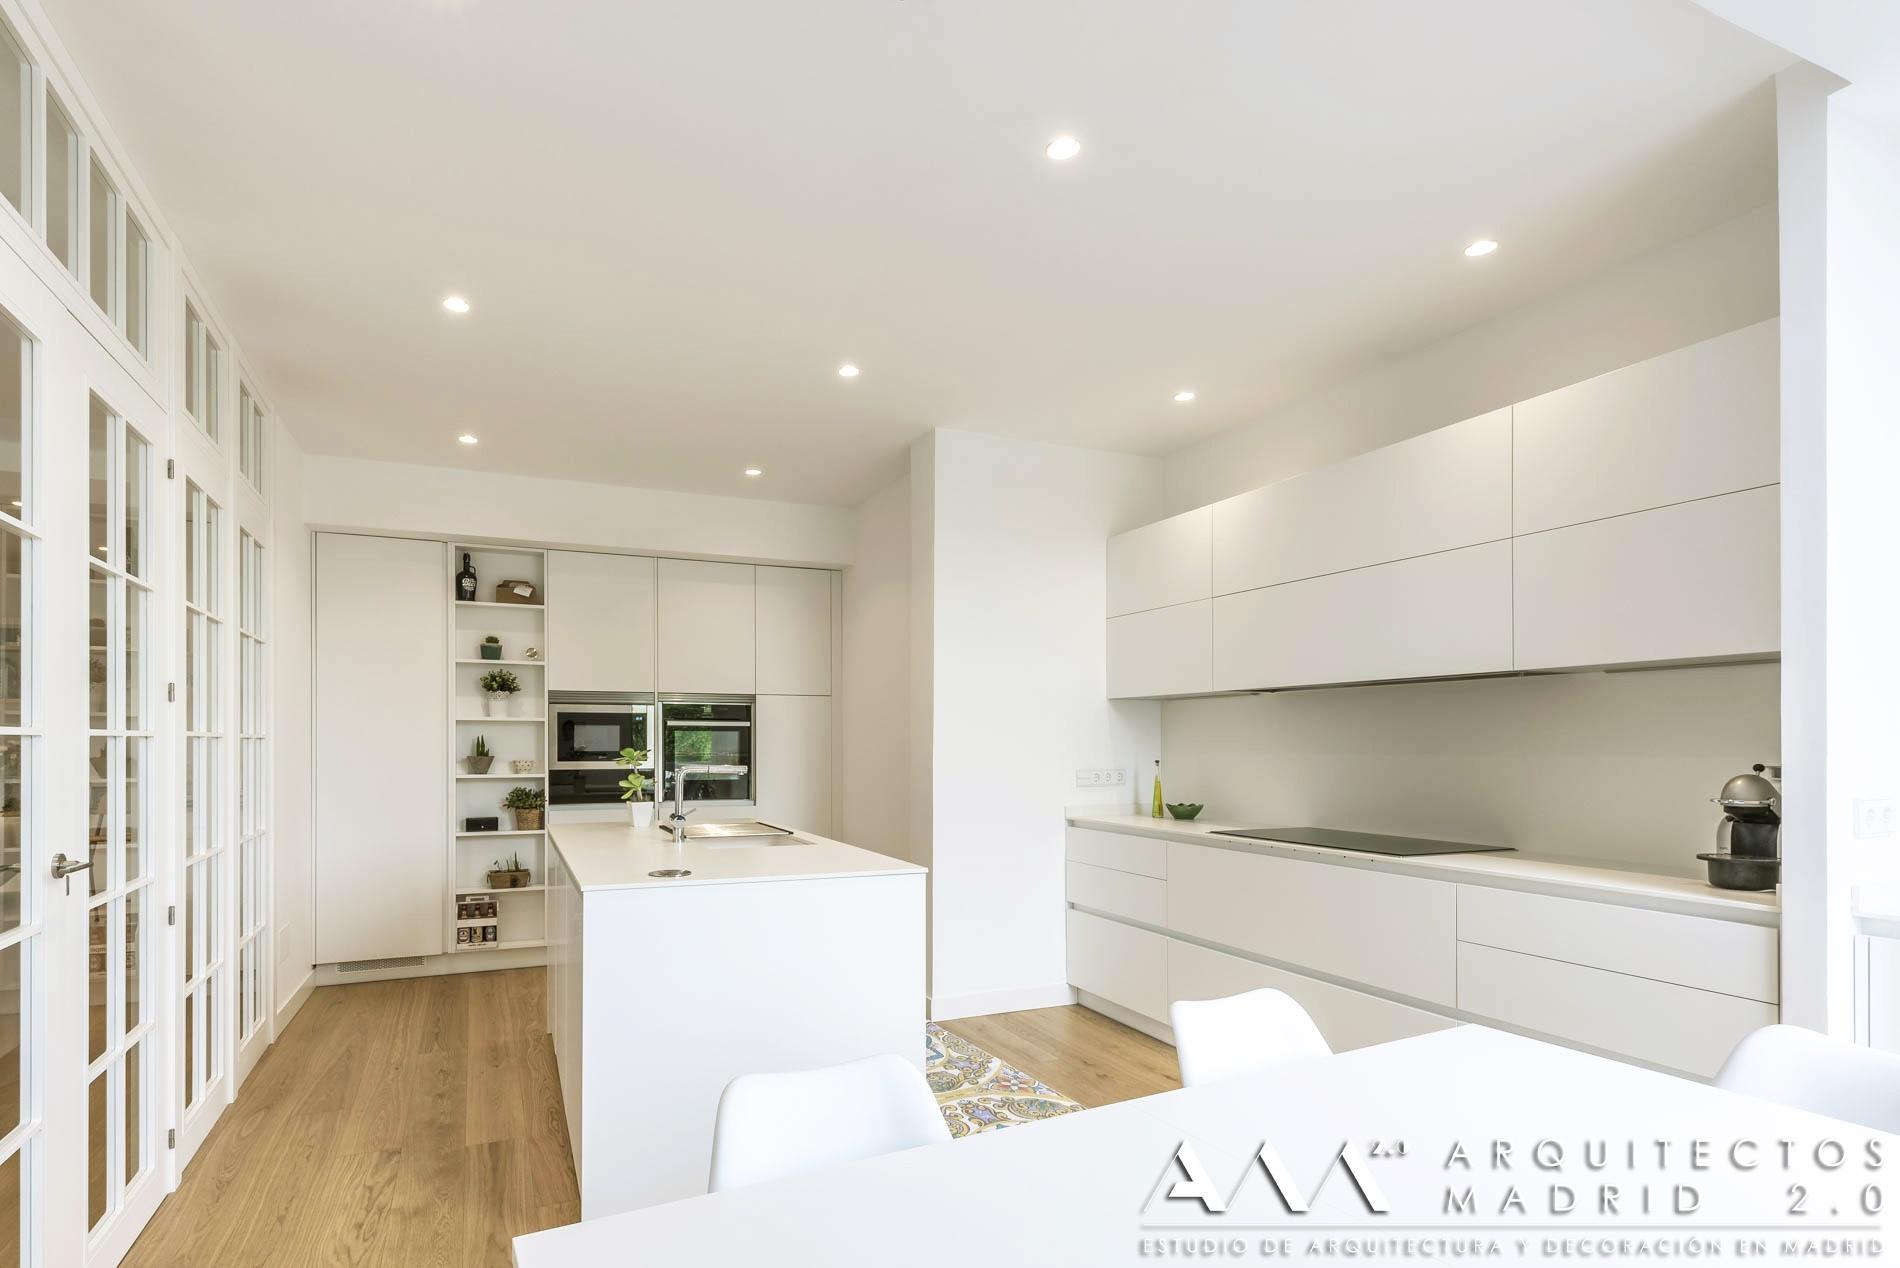 proyectos-reformas-integrales-decoracion-viviendas-housing-reform-projects-architects-madrid-13